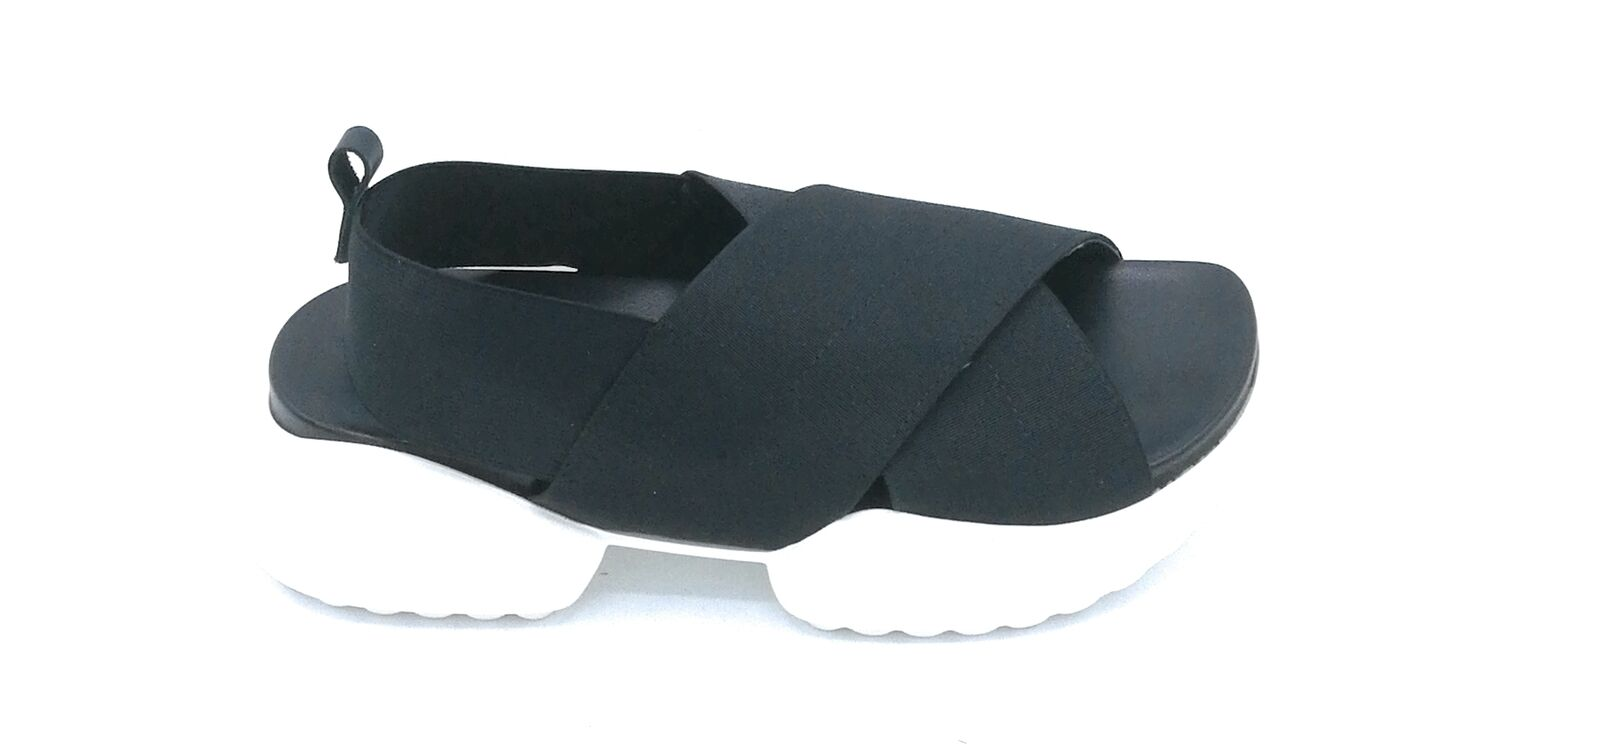 Ovyè MV8774 sandal sandal sandal stretch black-nude   black with rubber sole white 56b6b5